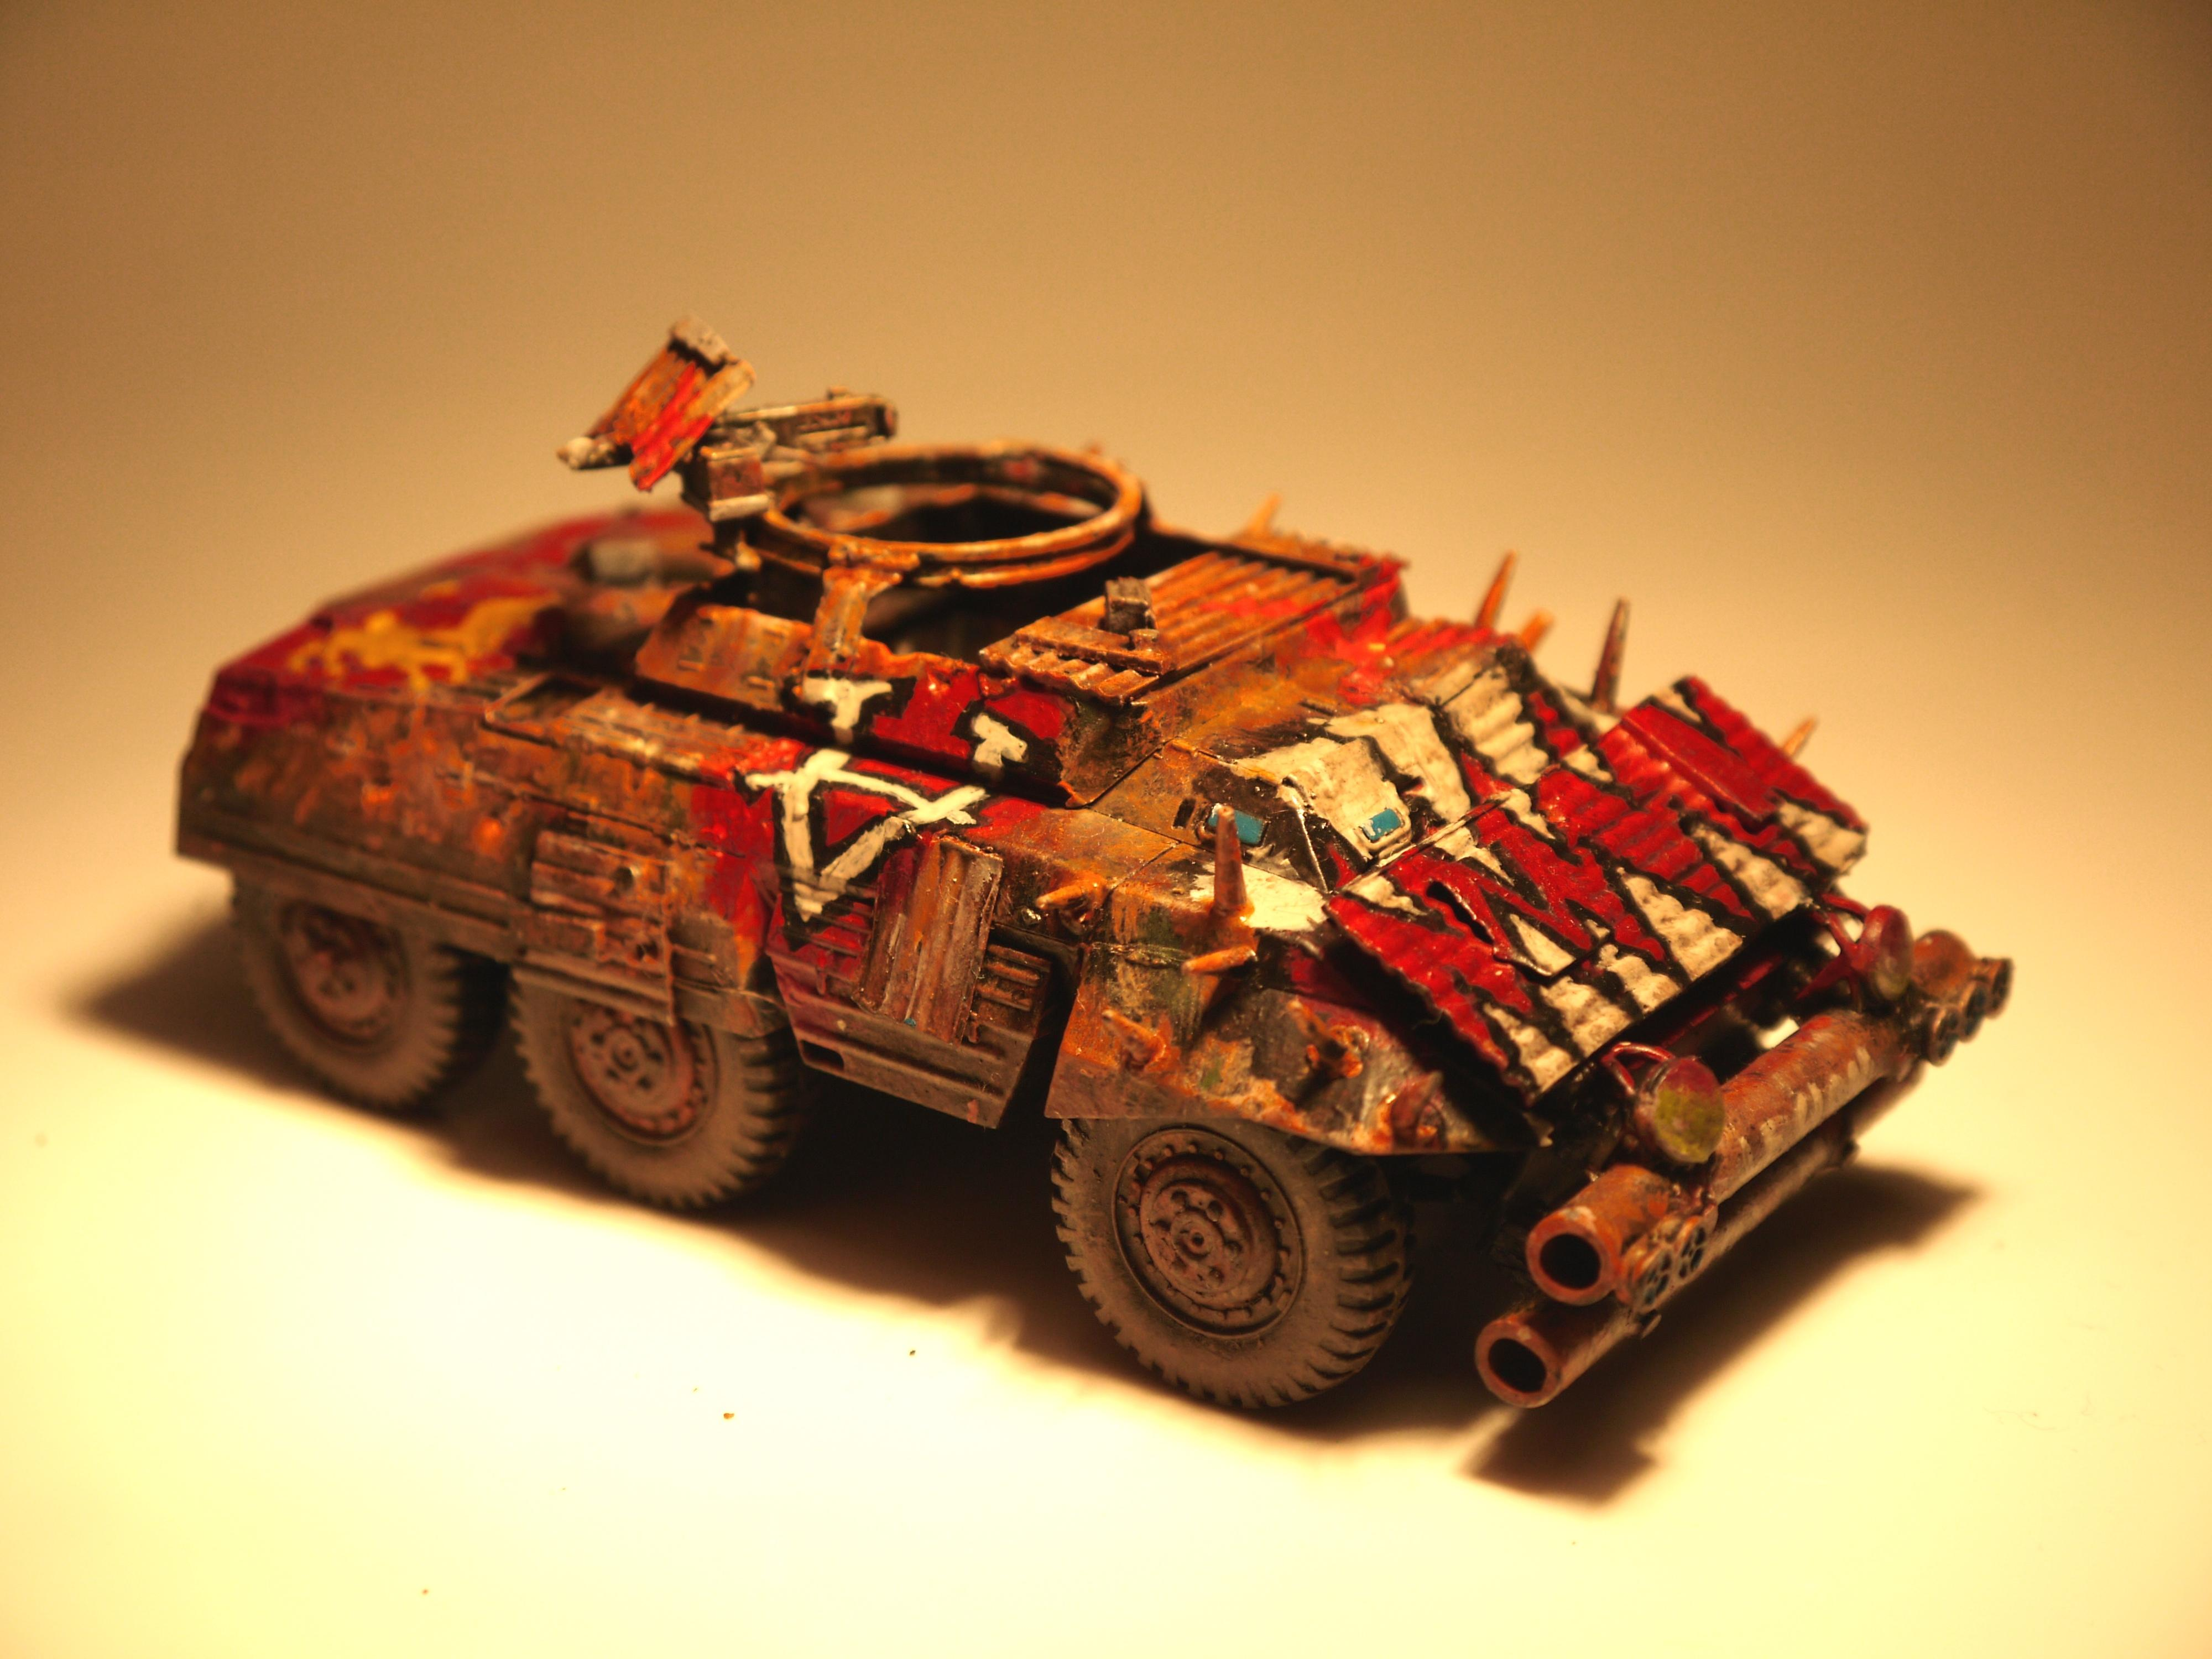 Armoured, Caesar's Legion, Fallout, Fallout. Post Apocalyptic, M8 Greyhound, Post Apocalyptic, Post-apocalyptic, Raider, Rust, Truck